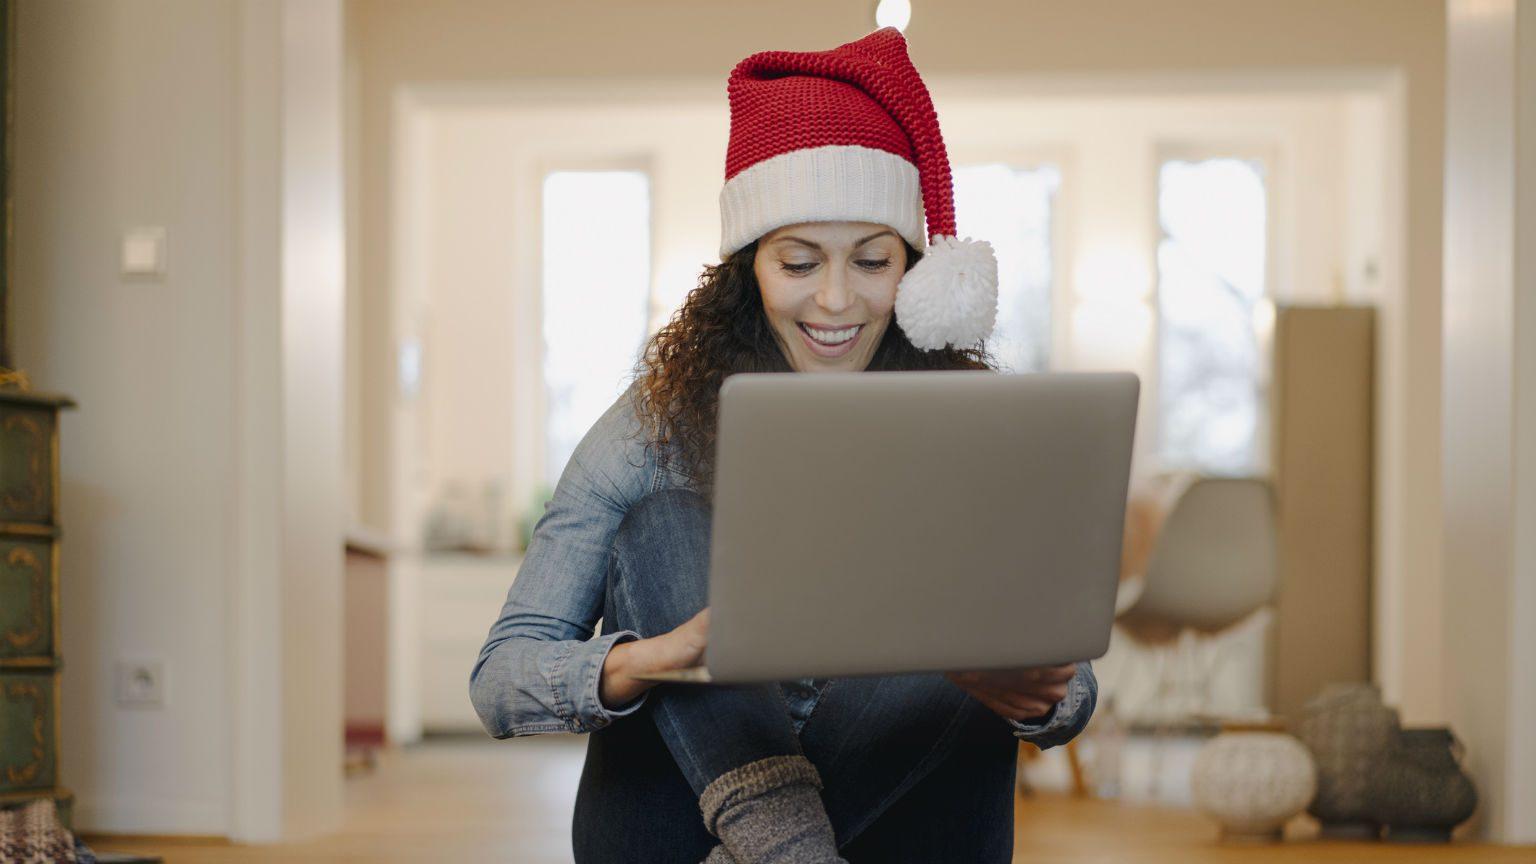 Women shopping online in Christmas hat